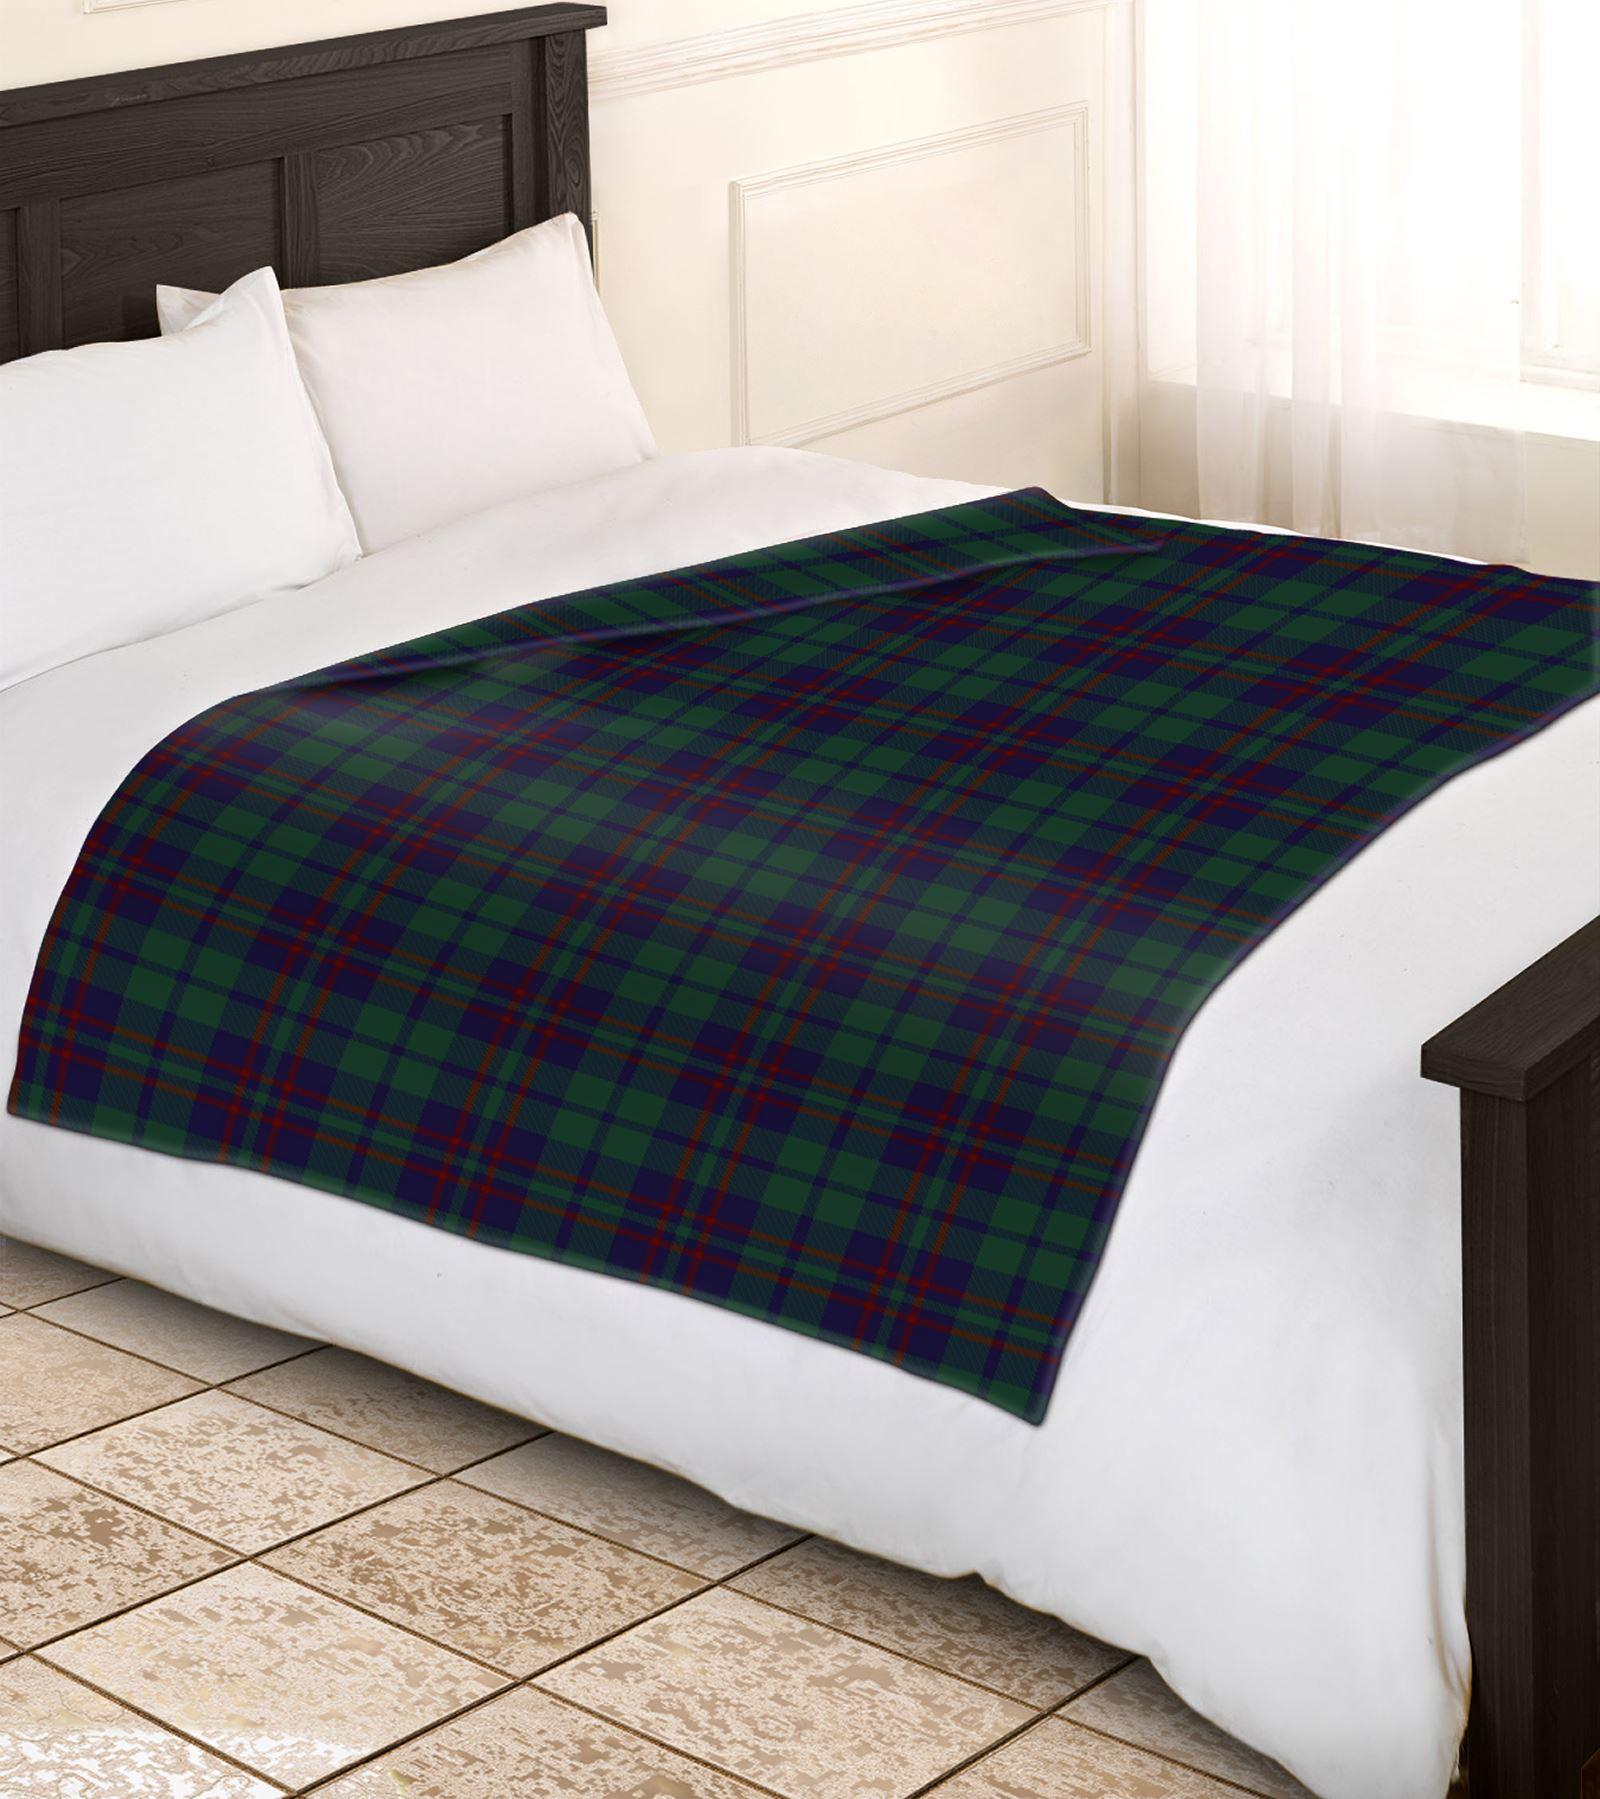 soft warm 200x240cm king size tartan check sofa throw bed fleece travel blanket ebay. Black Bedroom Furniture Sets. Home Design Ideas